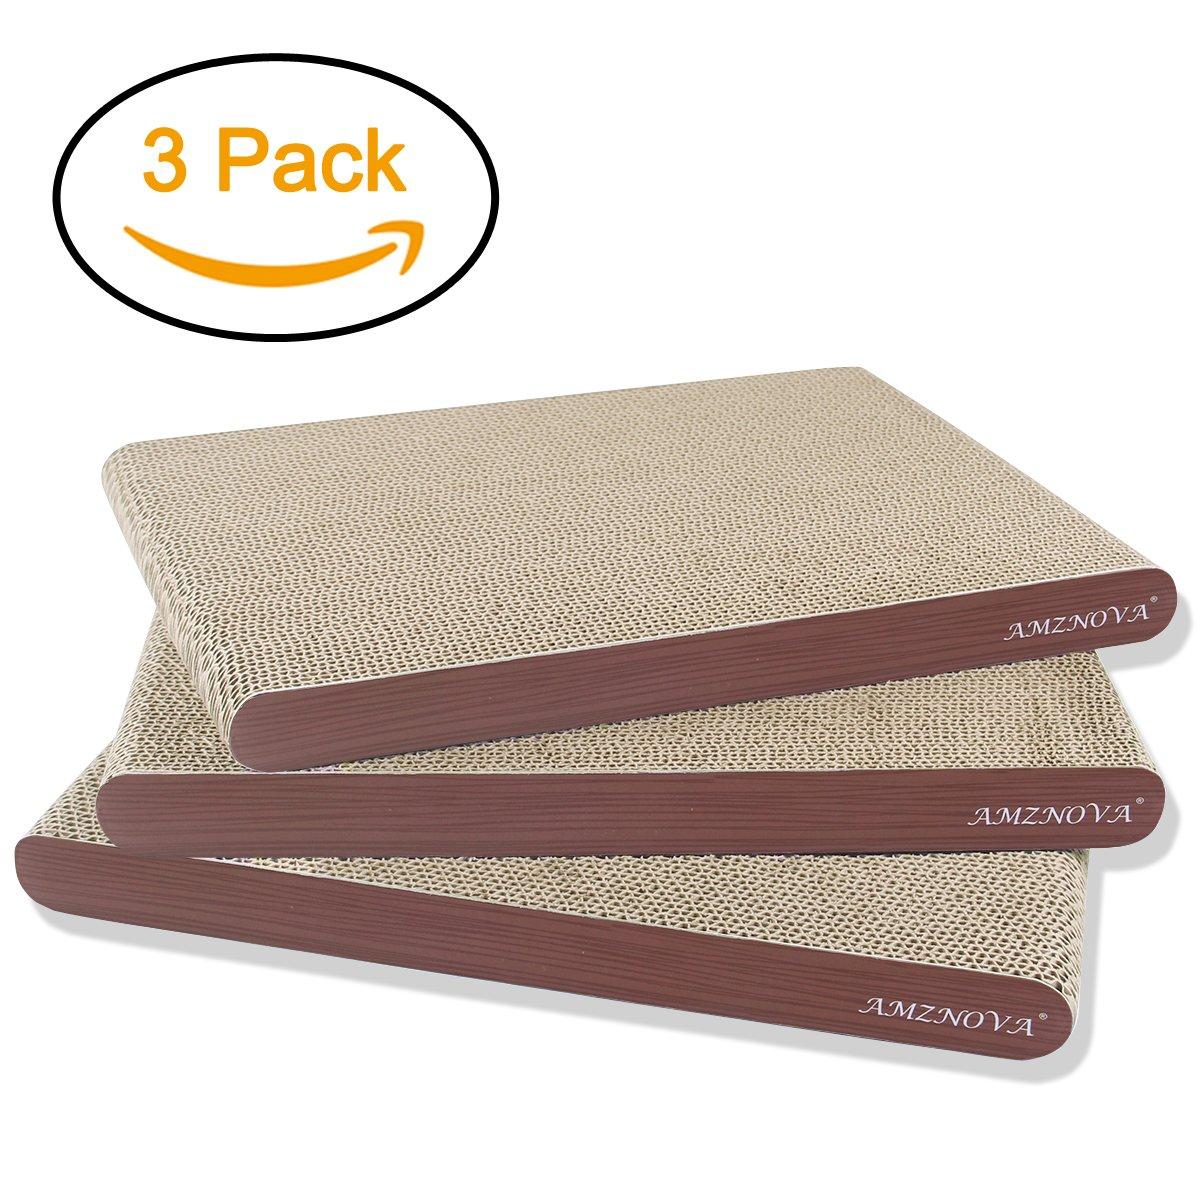 AMZNOVA Cat Scratcher Cardboard Scratching Pads Scratch Lounge Sofa Bed, Wide, Wood Floor Print, 3 Pack